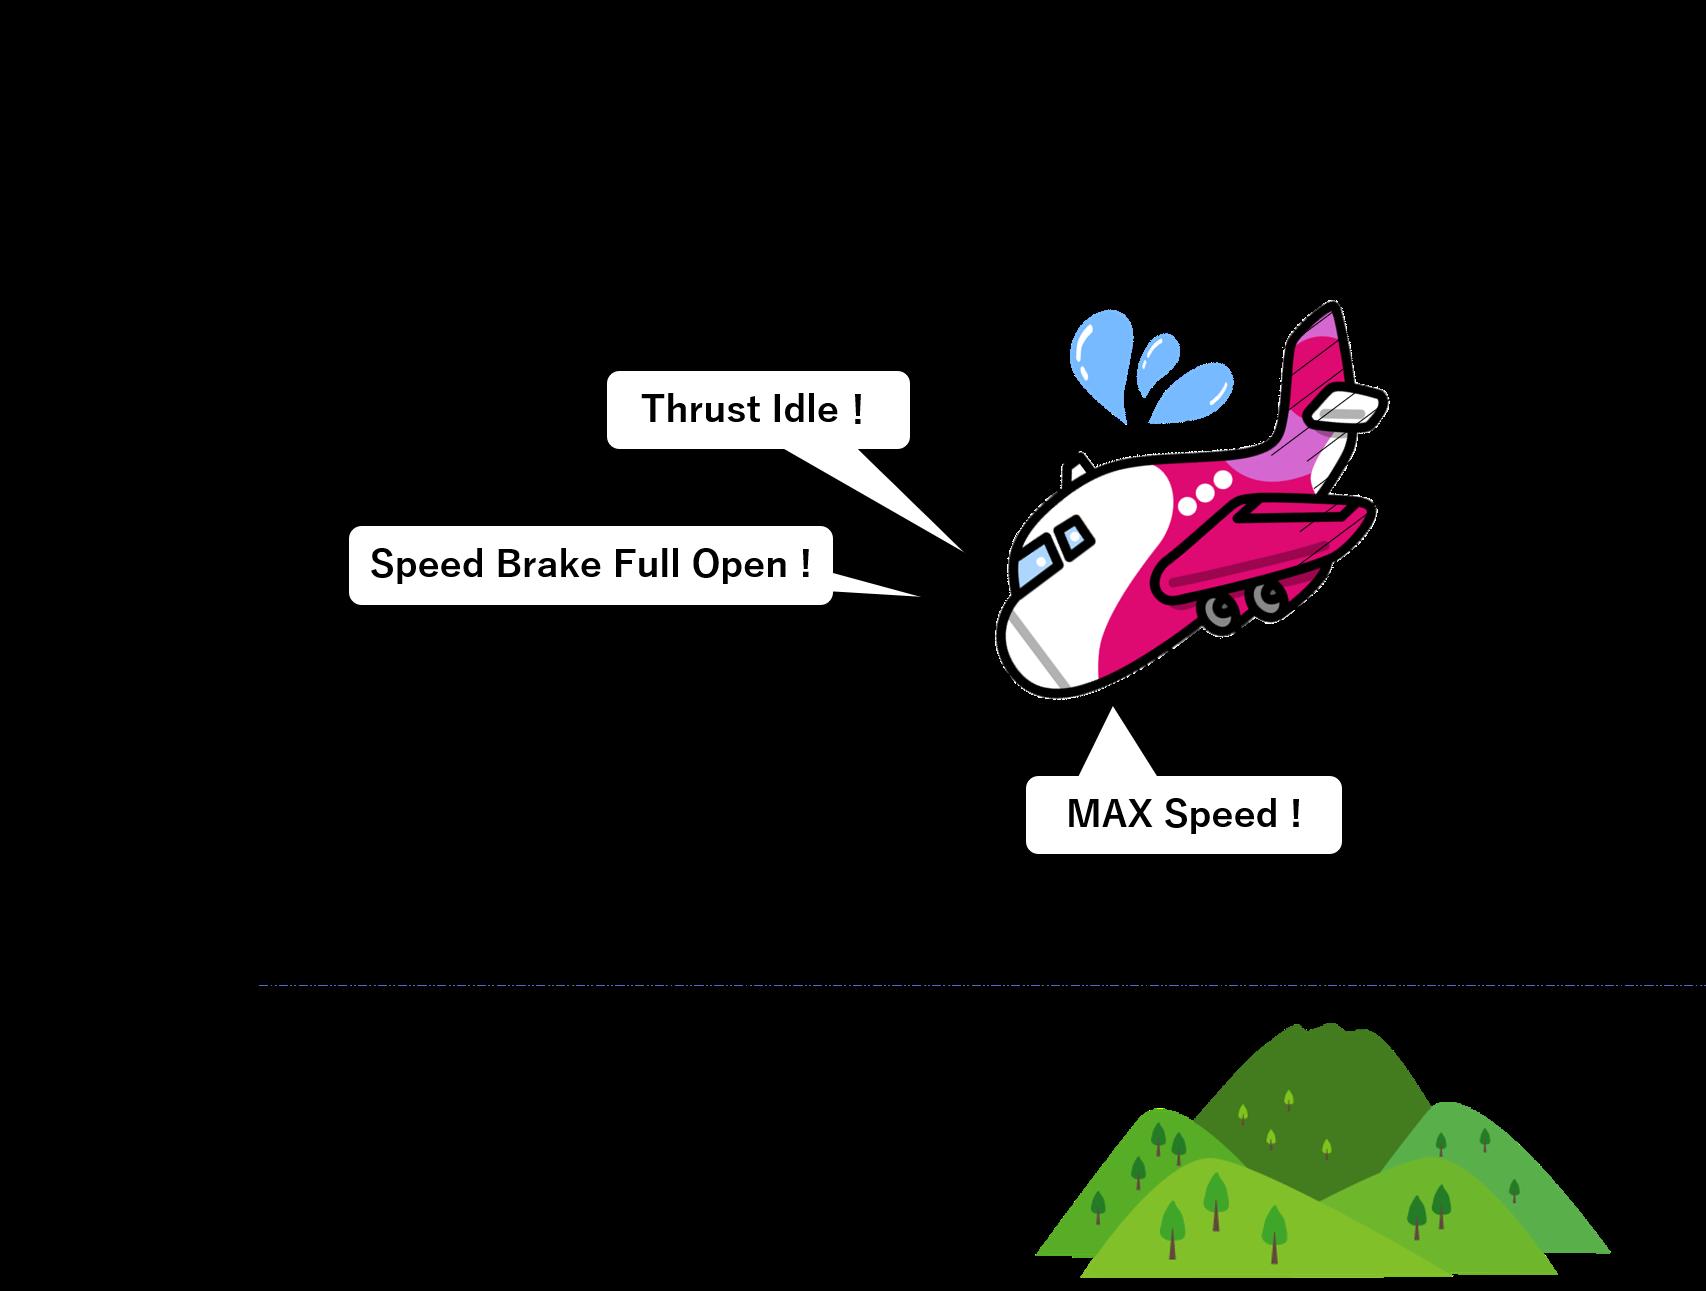 Emergency Descentのイメージ図